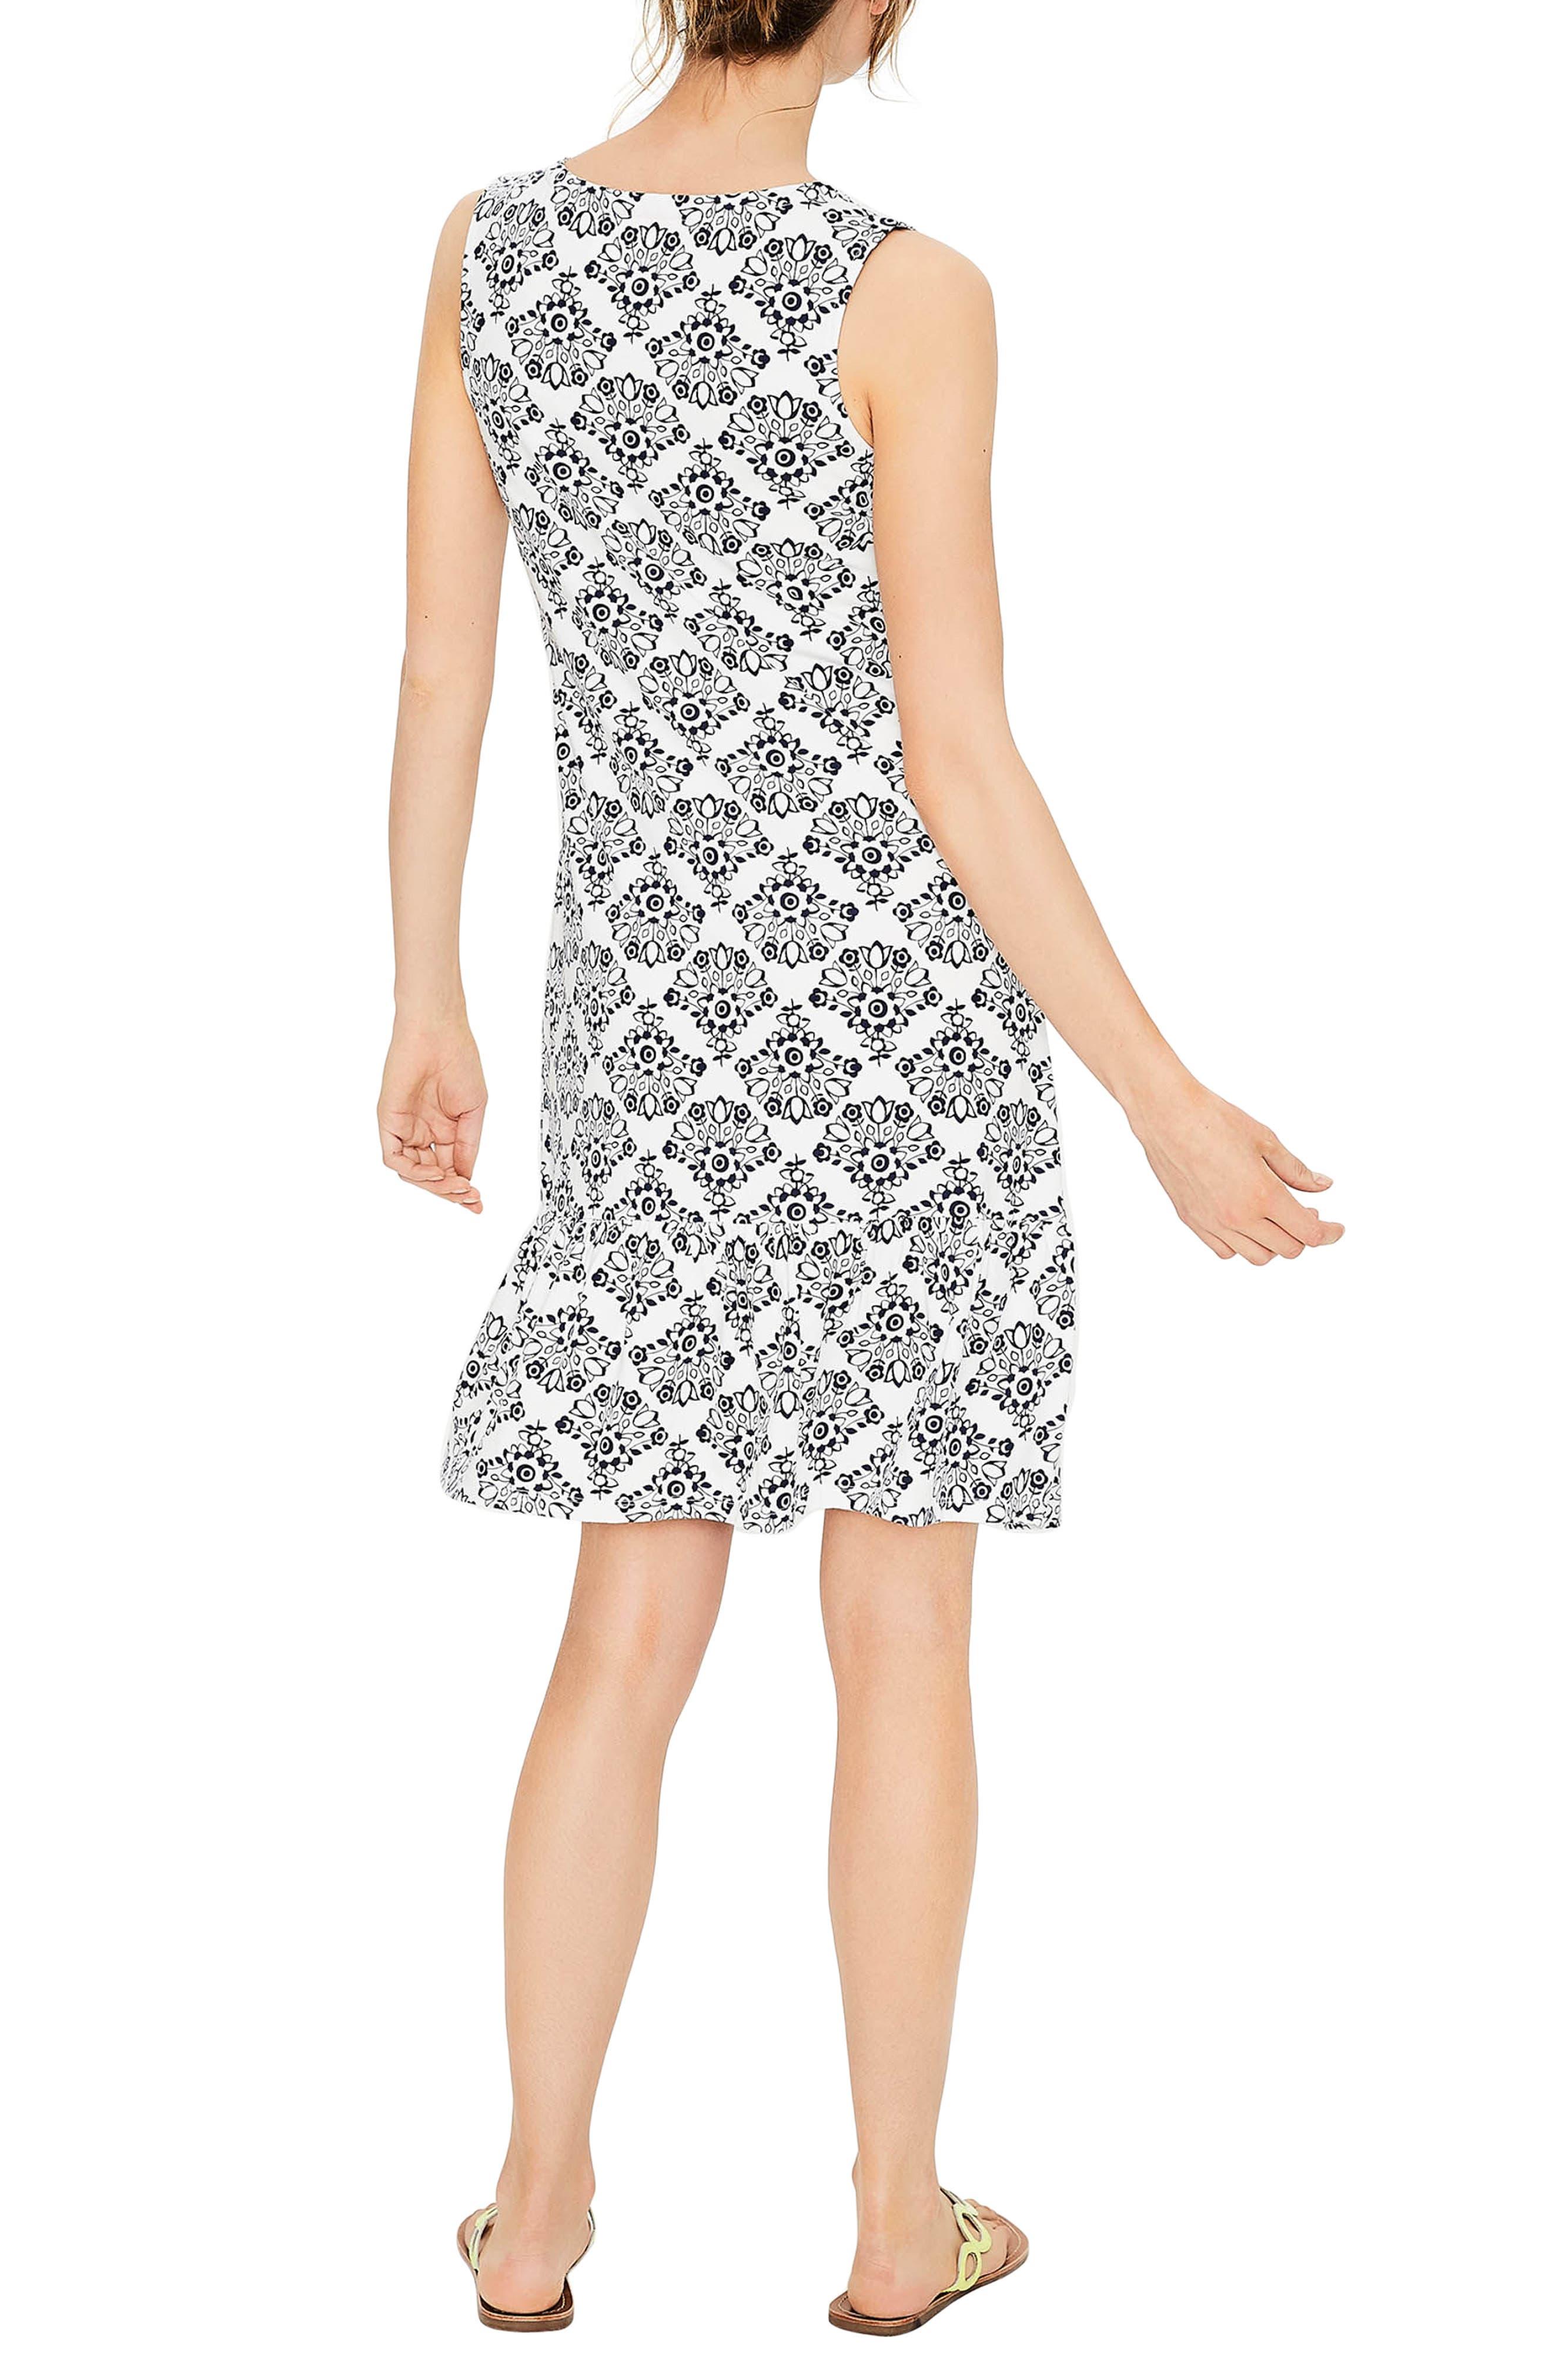 Tassel Tie Print Tank Dress,                             Alternate thumbnail 3, color,                             Ivory/Navy Floral Bo